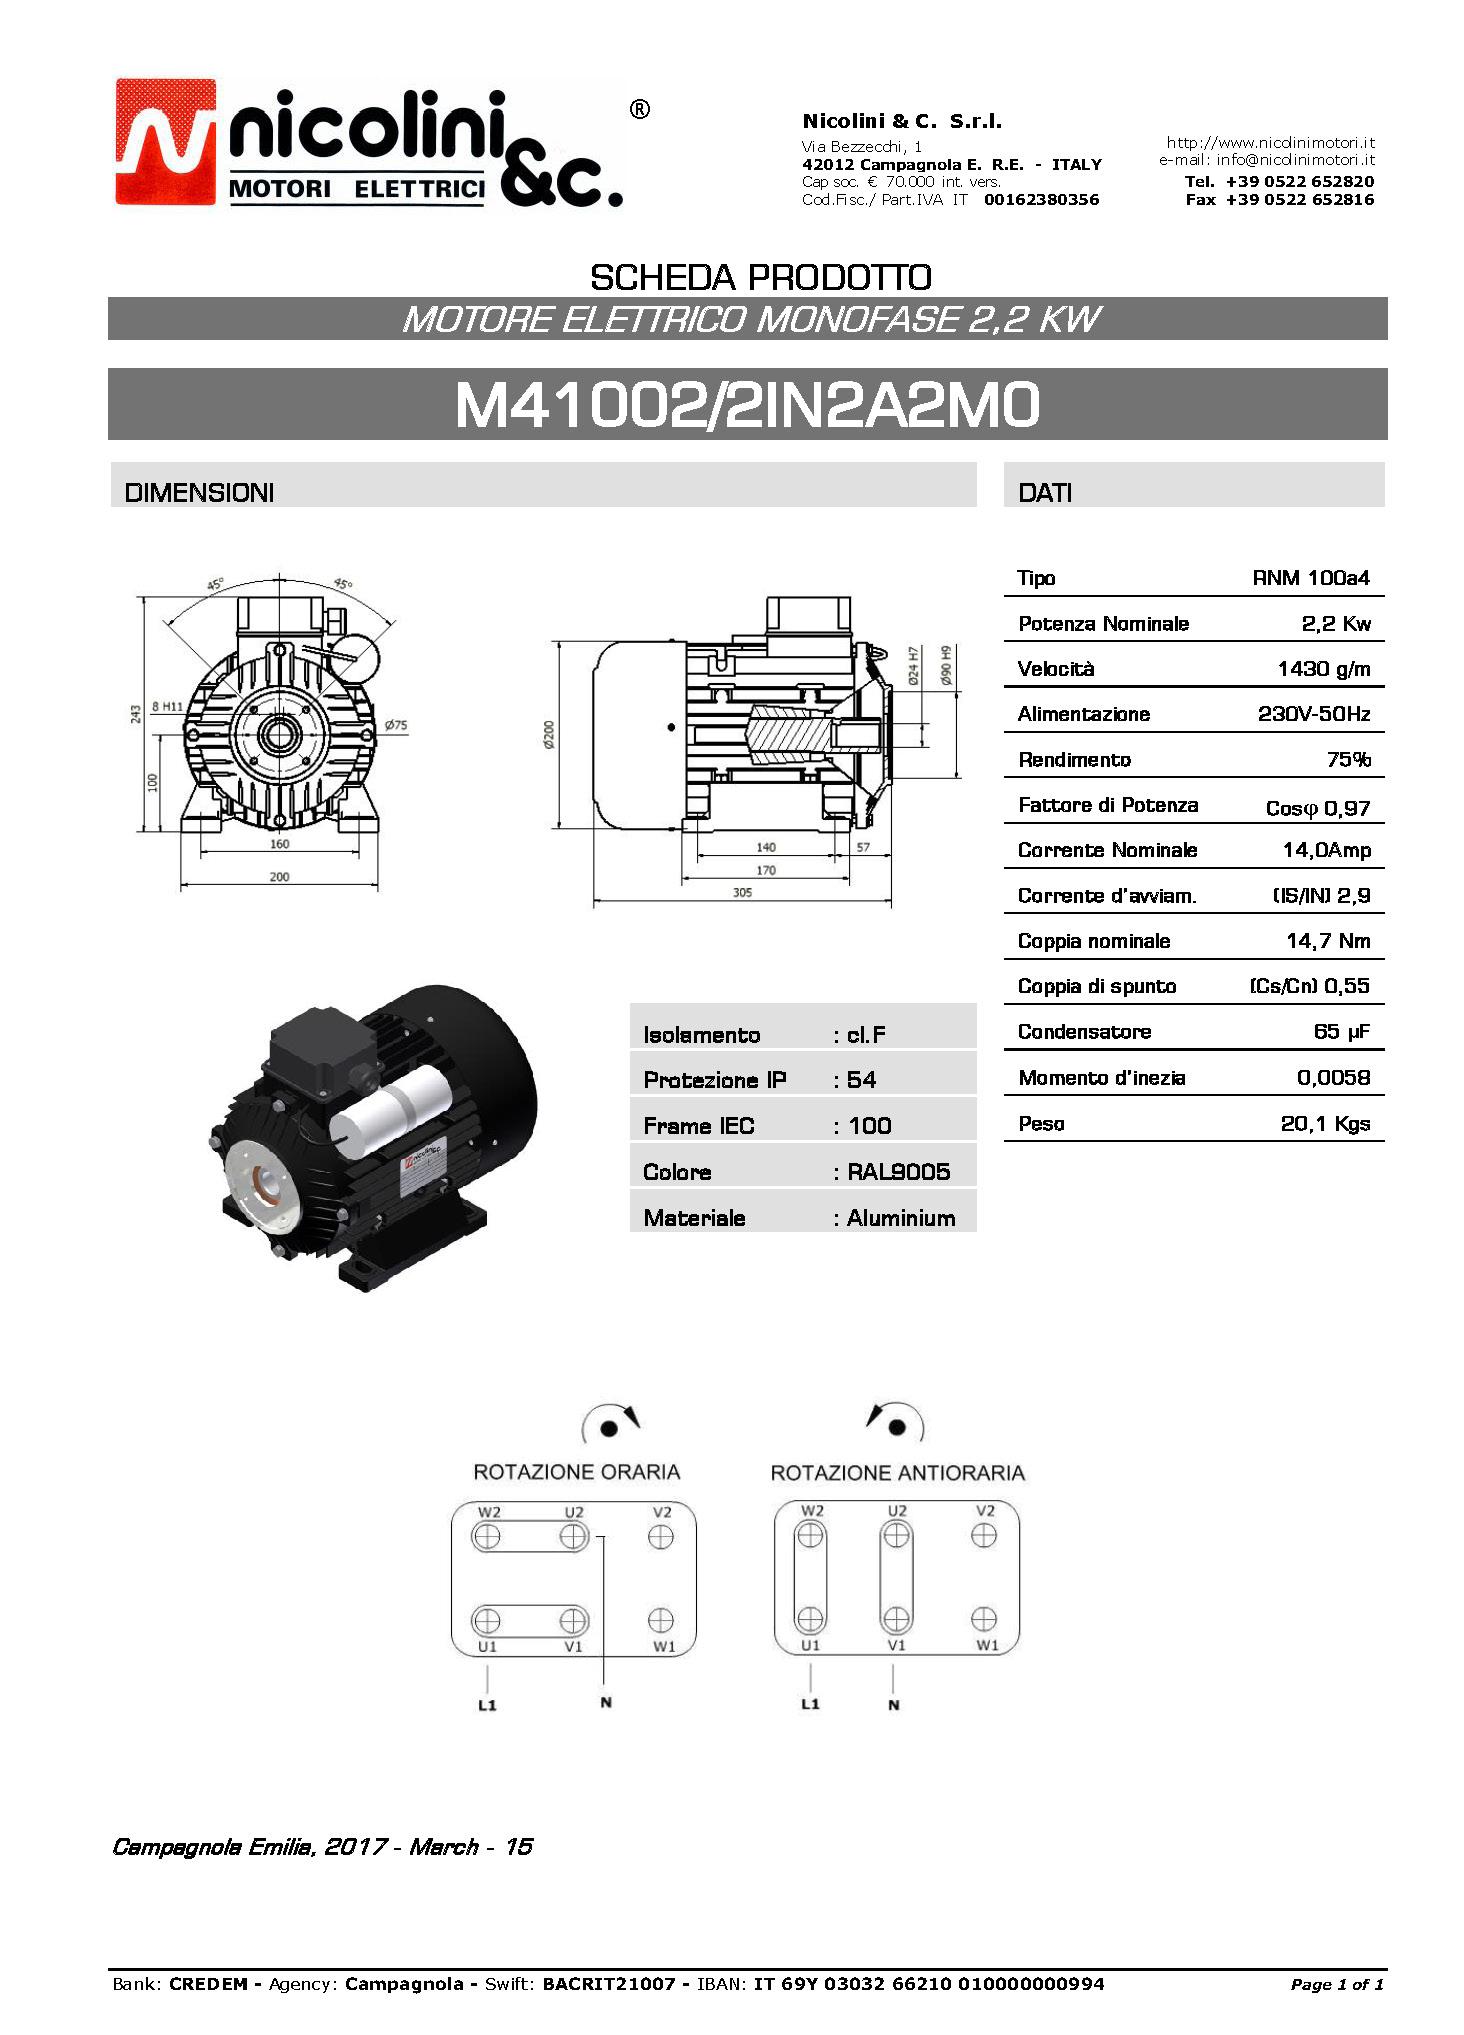 m41002-2in2a2m0-r00-1-.jpg